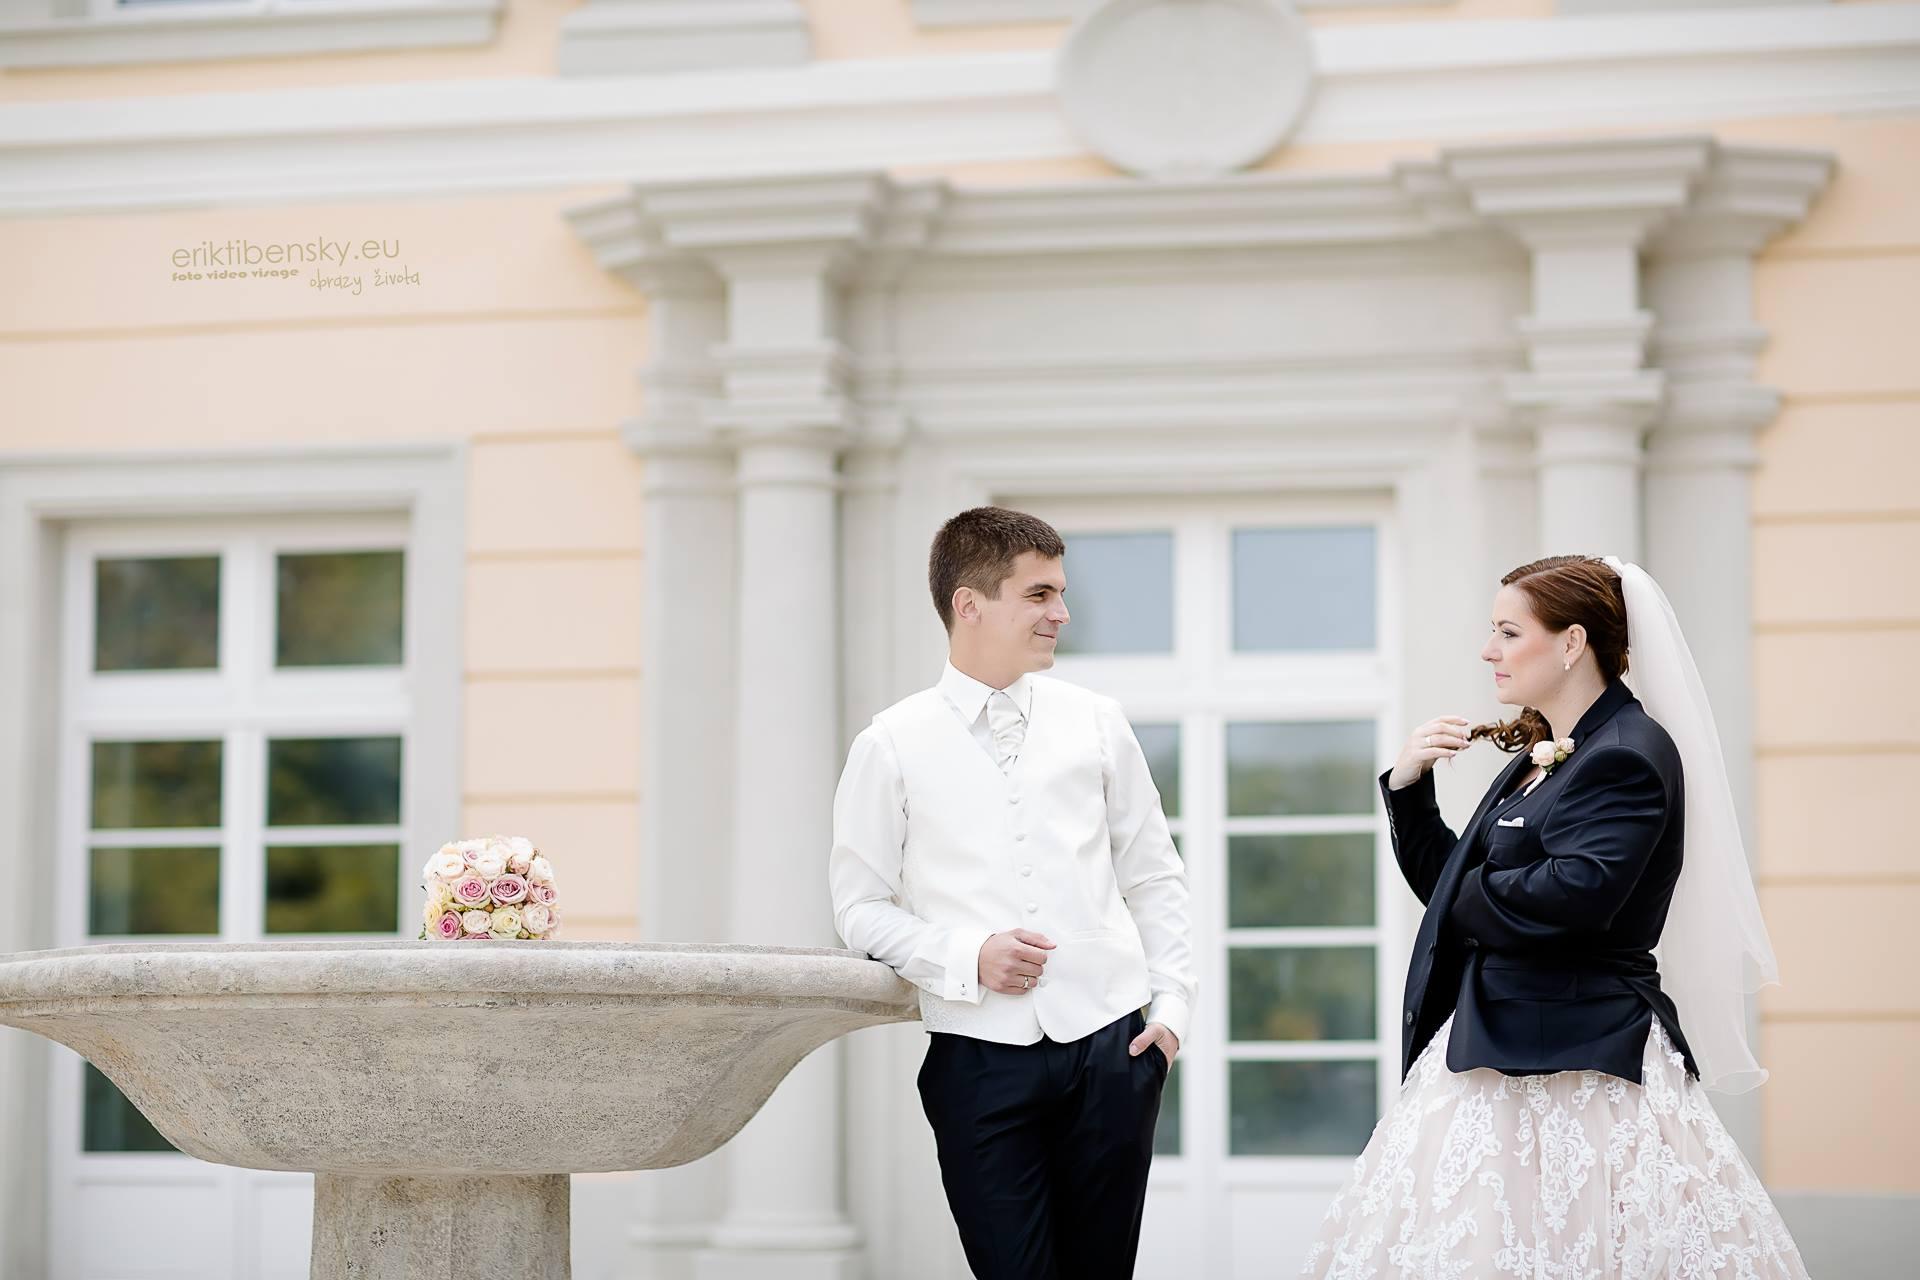 eriktibensky-eu-svadobny-fotograf-wedding-photographer-3076